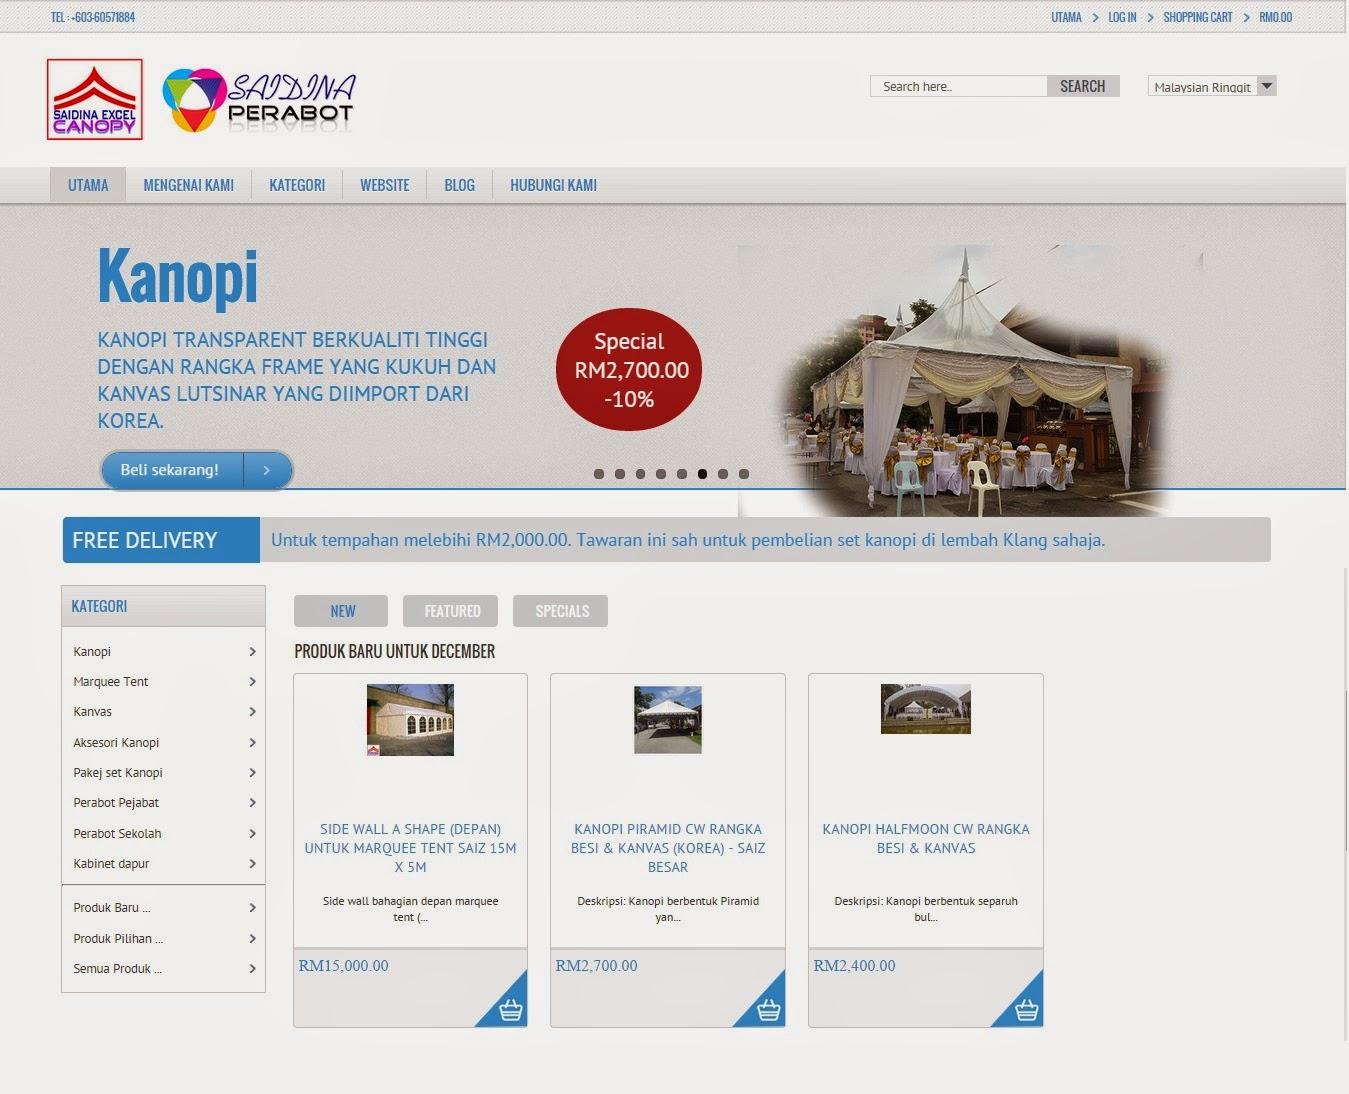 Pelancaran Mudah | One Stop Canopy & Furniture | Kedai Online